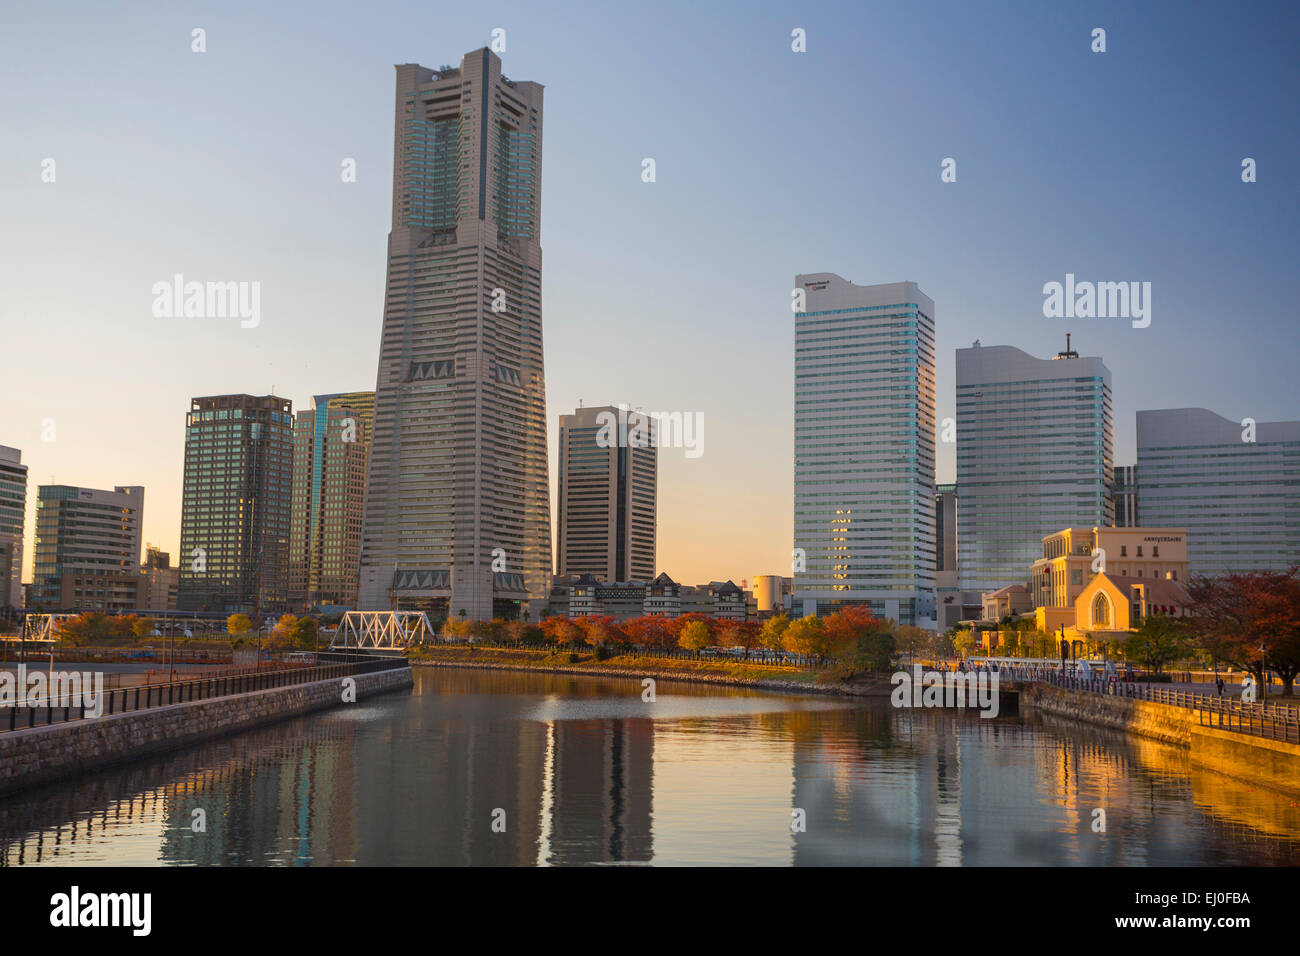 Building, Japan, Asia, Landmark, Yokohama, City, architecture, canal, reflection, skyline, evening, warm - Stock Image